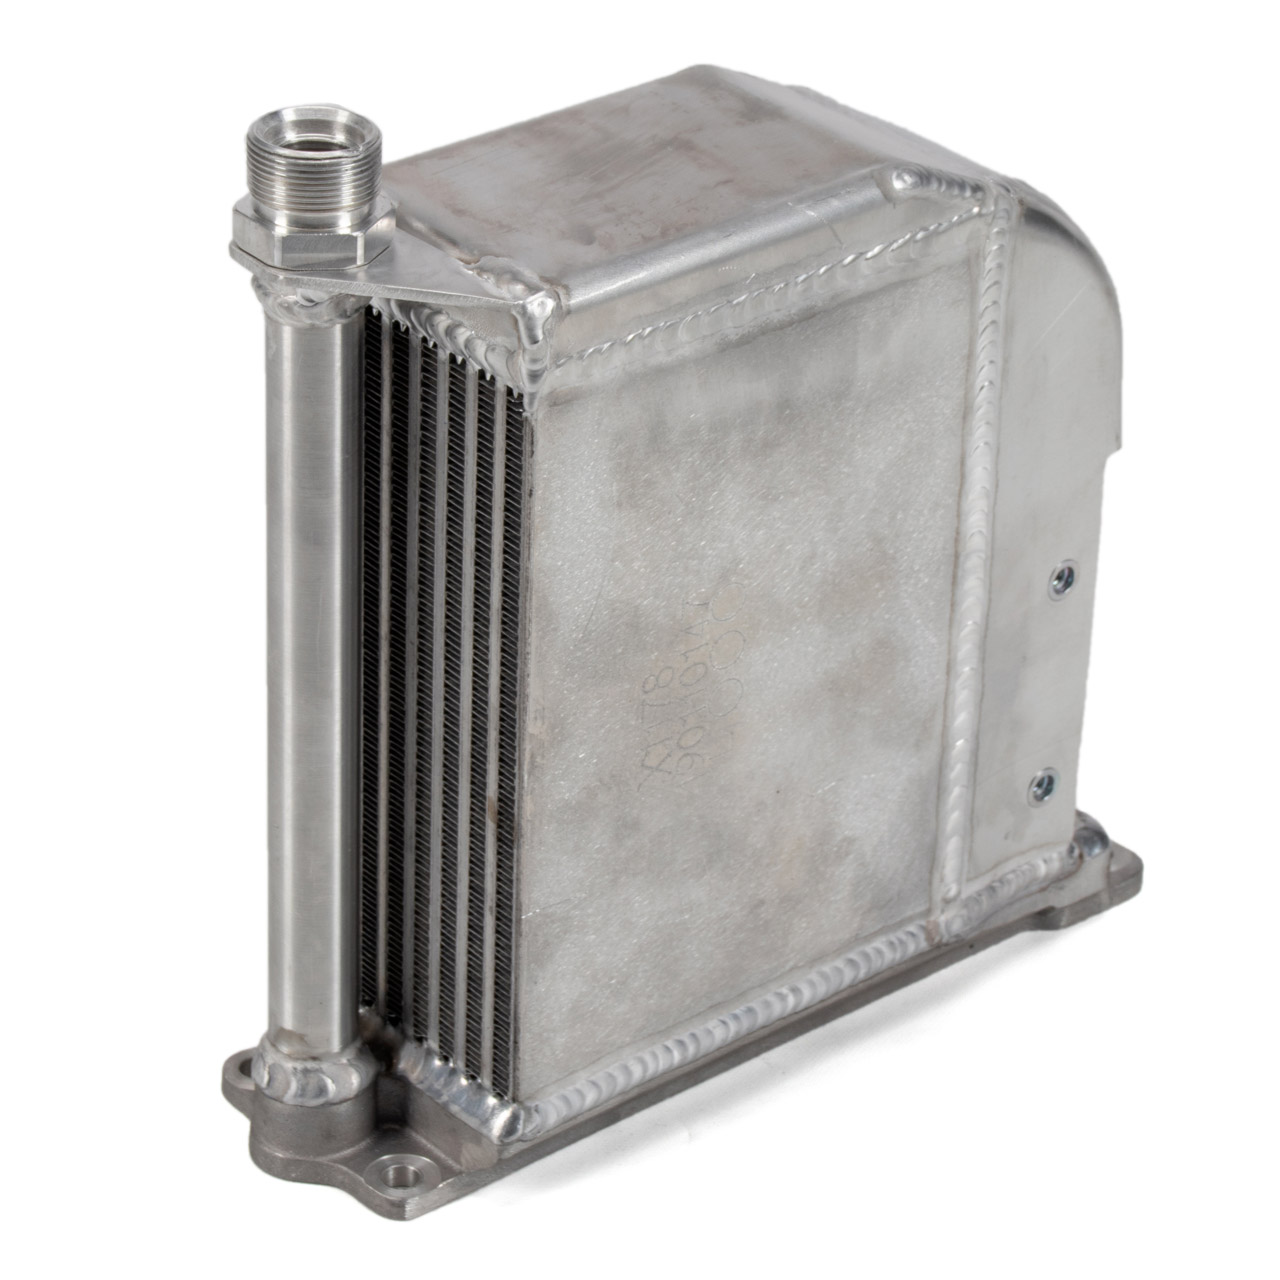 Ölkühler Motorölkühler Kühler PORSCHE 911 2.2-2.3 912 1.6 1965-1971 90110704103